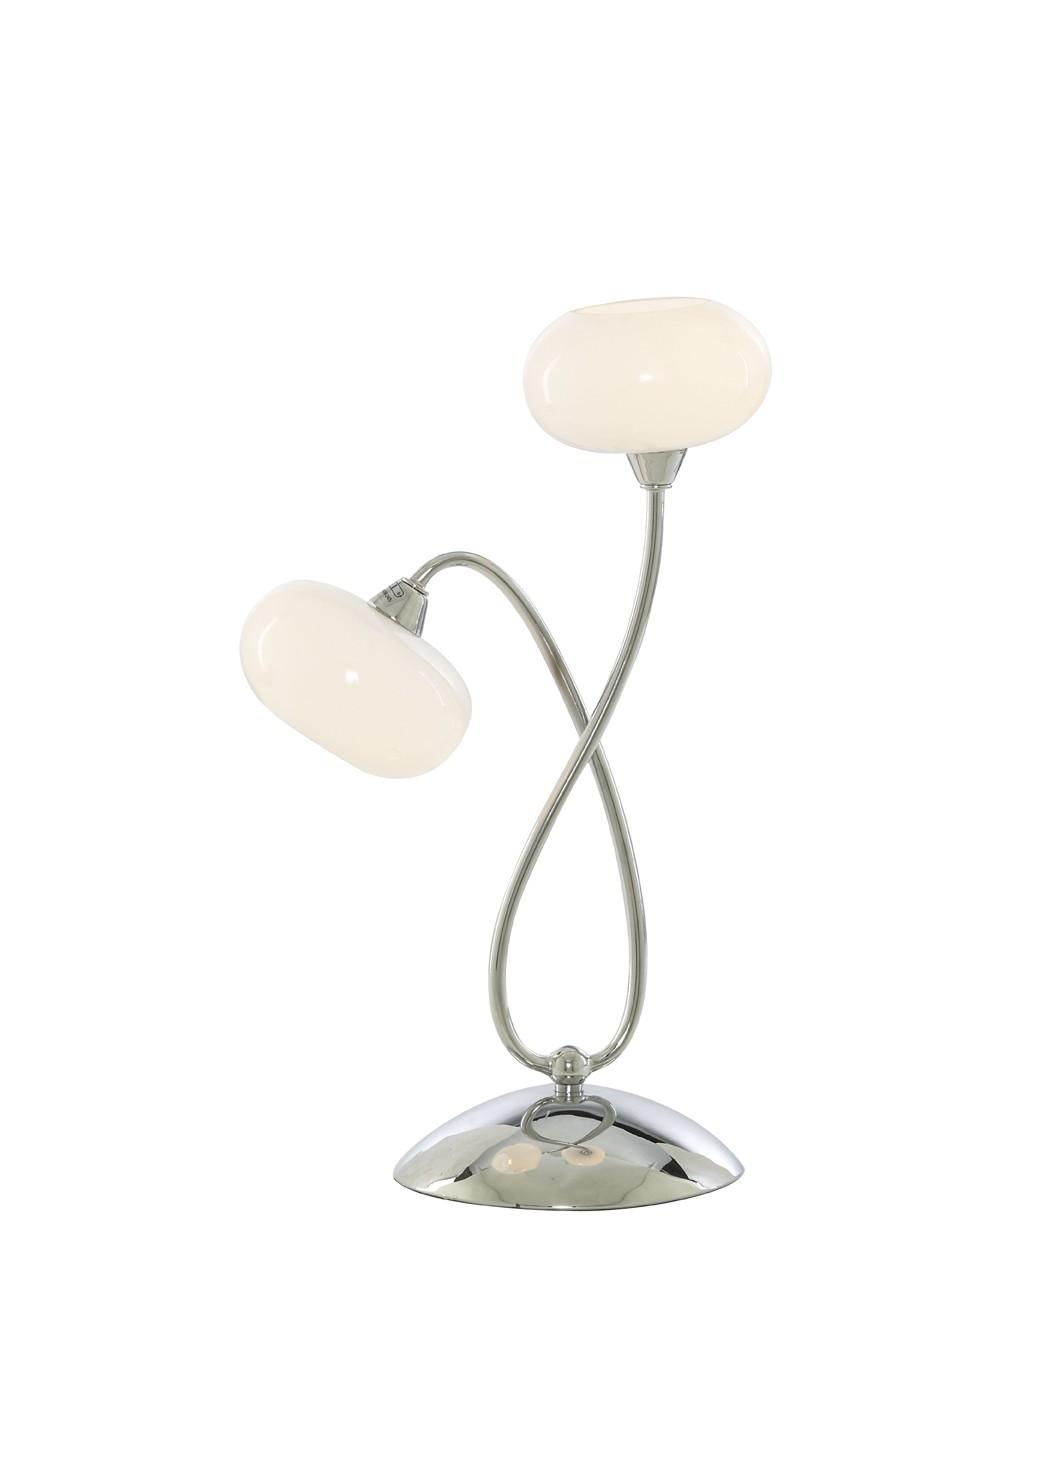 2-light-table-lamp-photo-13